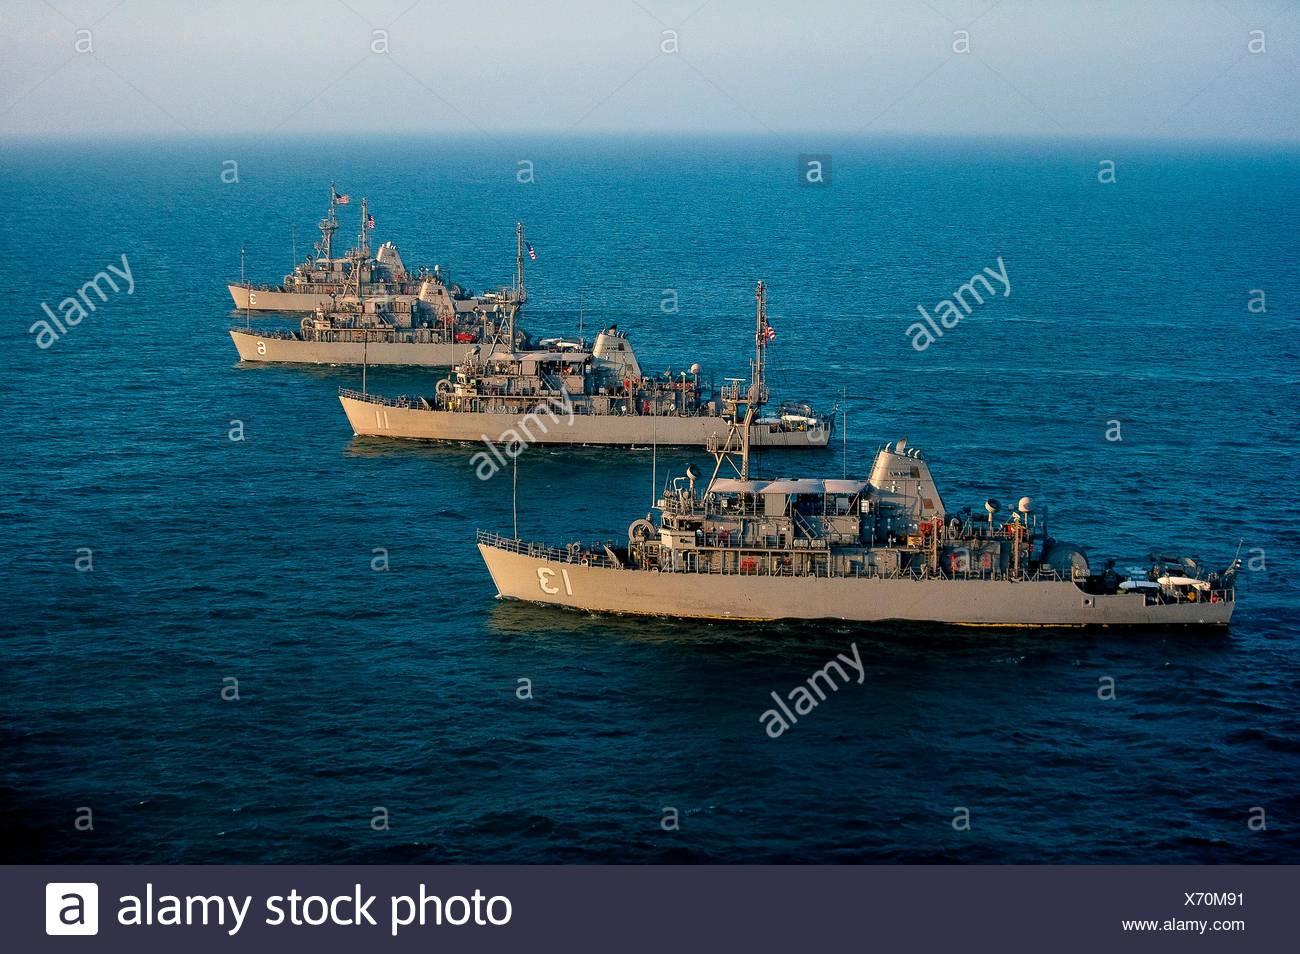 ARABIAN GULF (Dec. 6, 2016) The Avenger class mine countermeasure (MCM) ships USS Dextrous (MCM 13), USS Gladiator (MCM 11), USS Devastator (MCM 6), - Stock Image